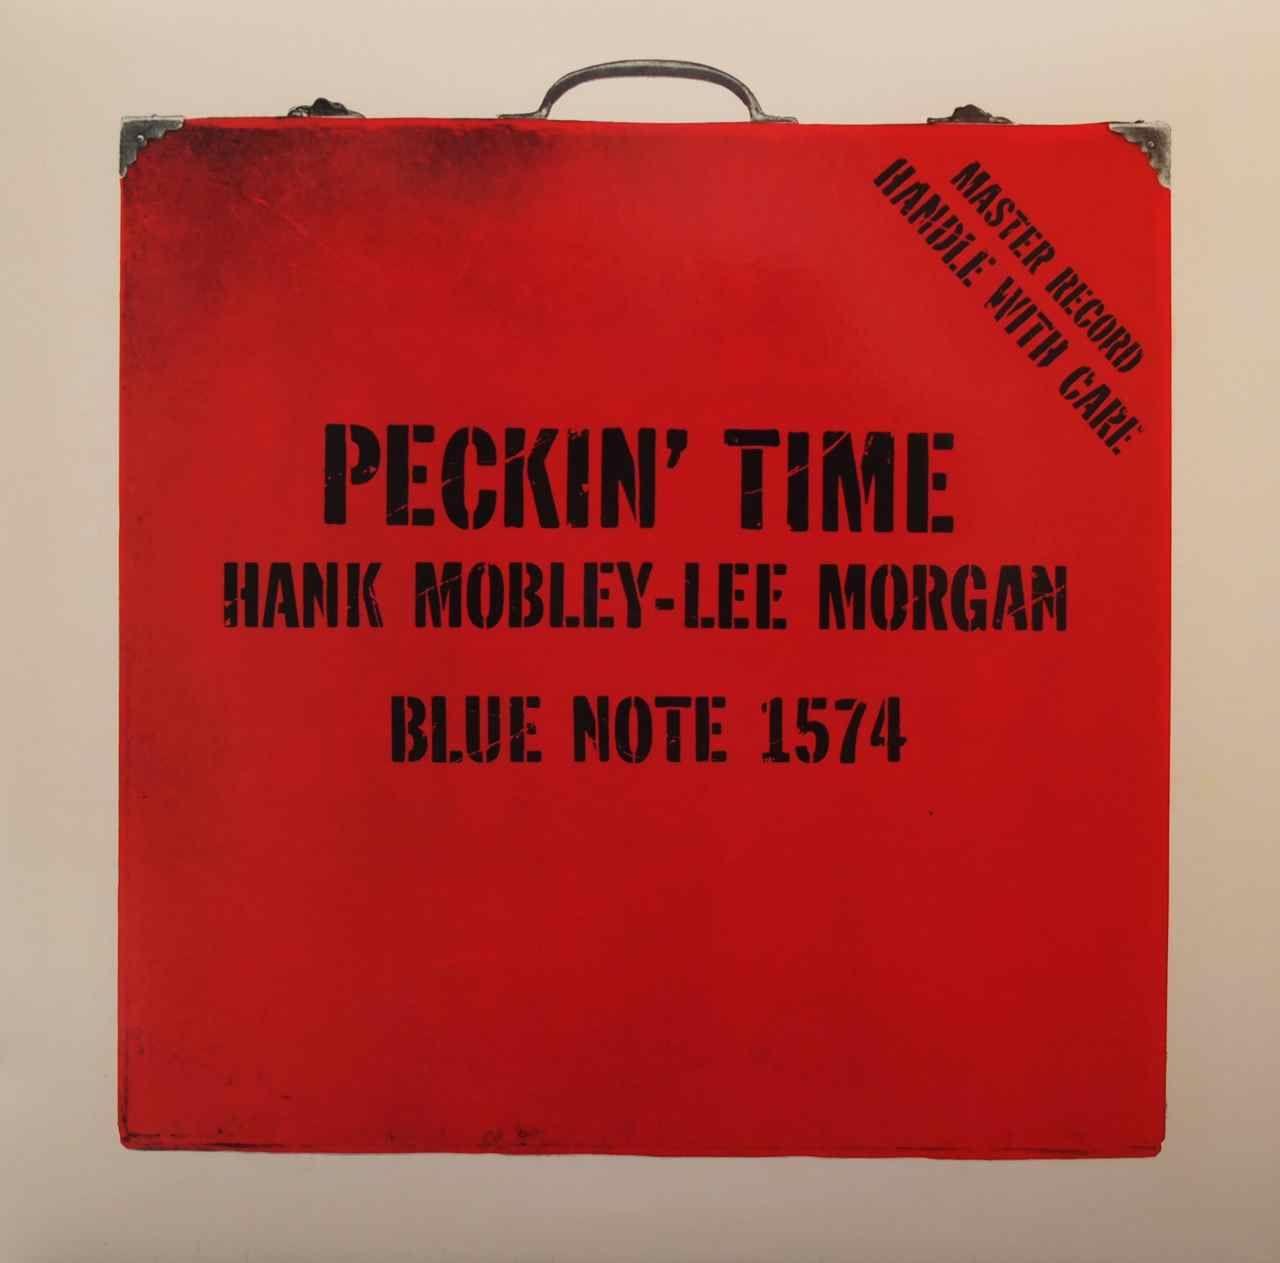 Peckin Time - Hank Mobley & Lee Morgan